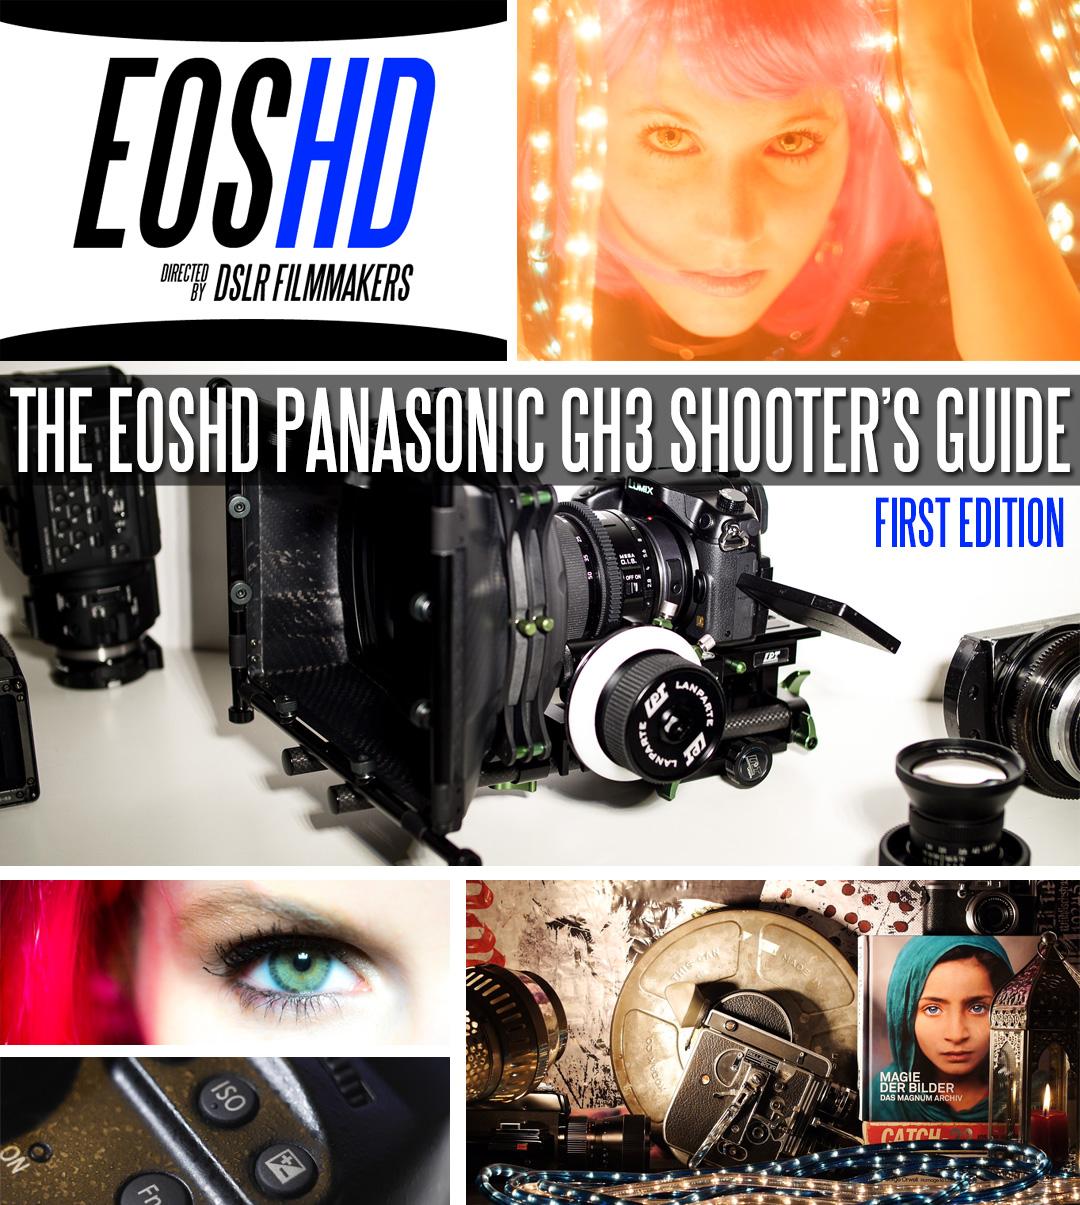 The EOSHD Panasonic GH3 Shooter's Guide